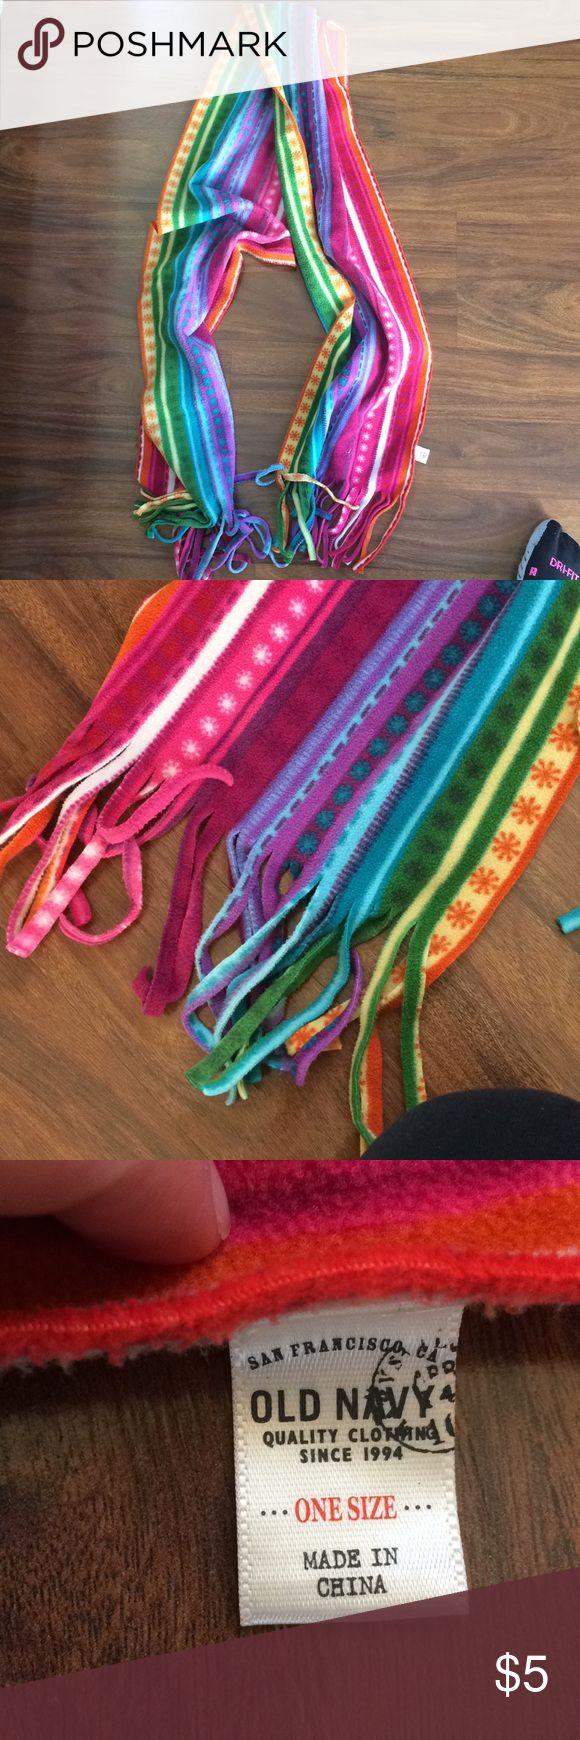 Rainbow Old Navy scarf Rainbow fuzzy scarf Old Navy Accessories Scarves & Wraps